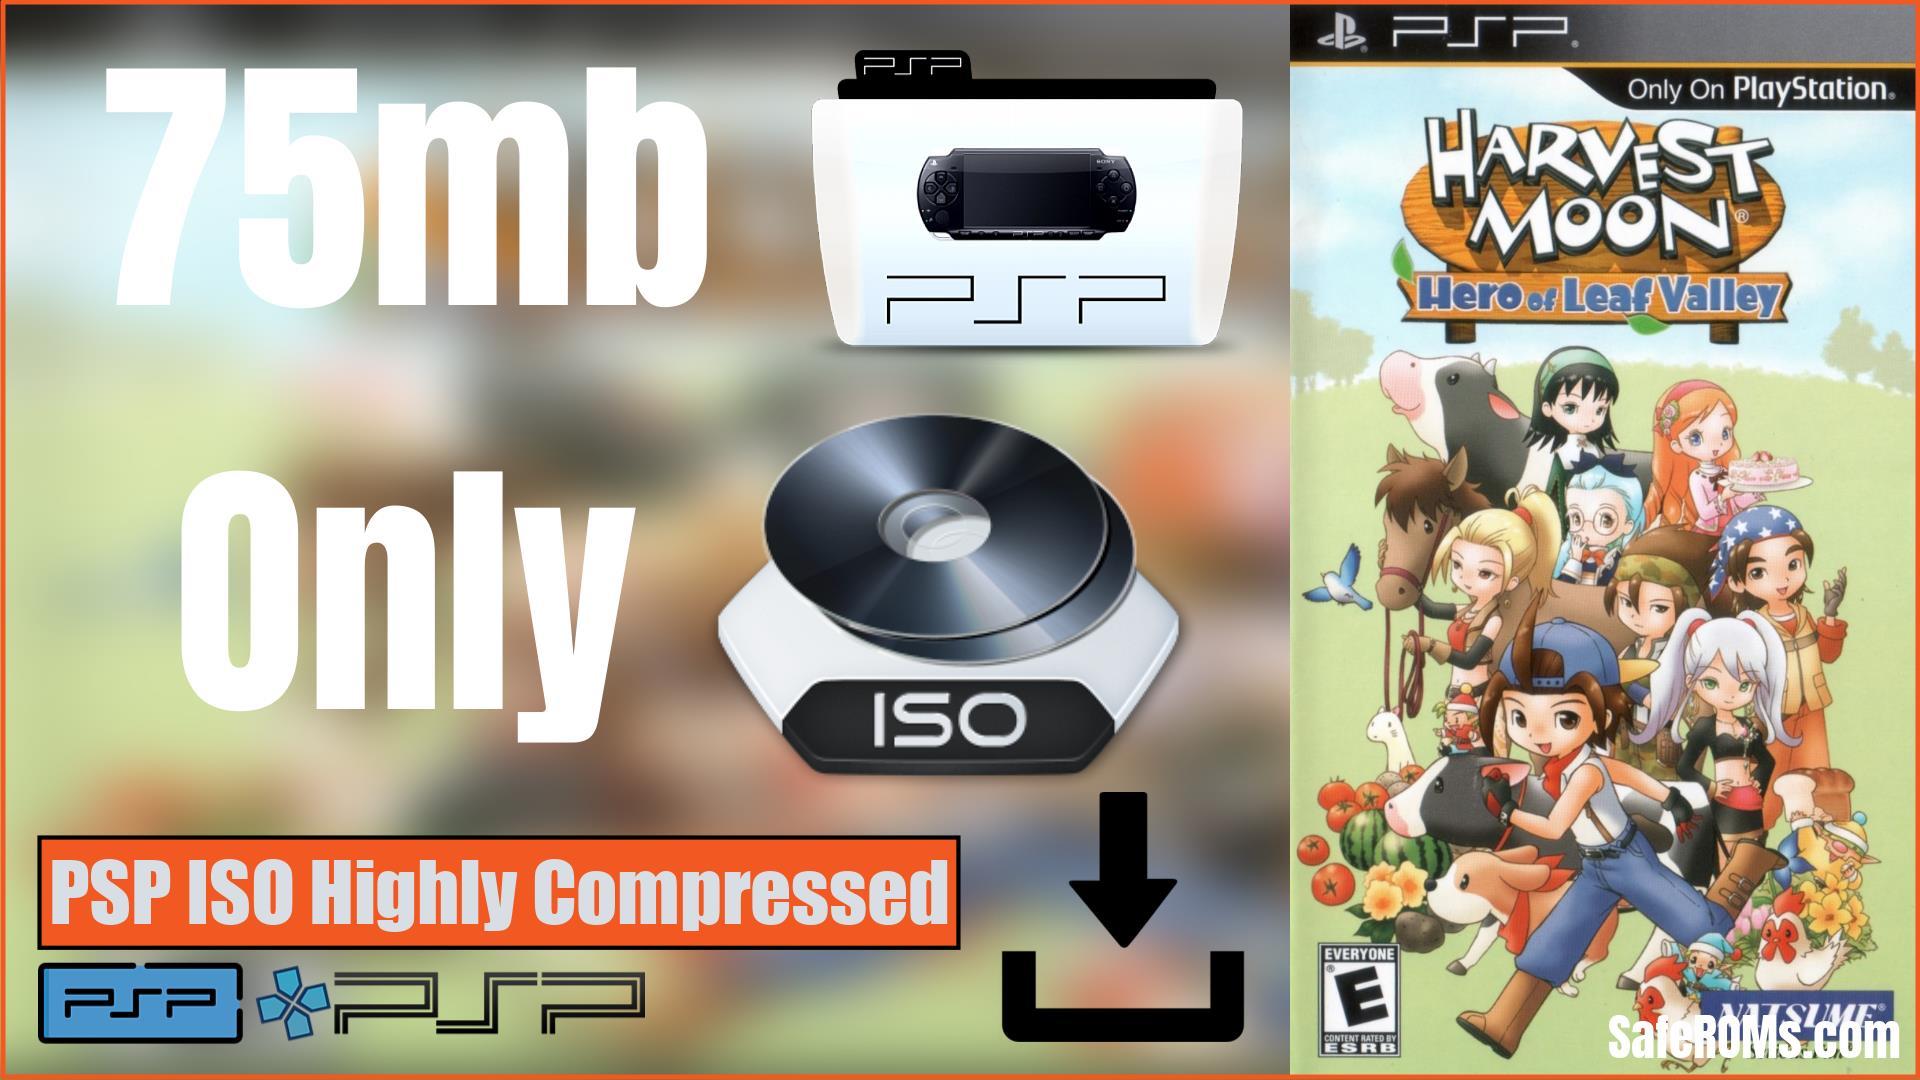 Harvest Moon Hero of Leaf Valley PSP ISO Highly Compressed Download